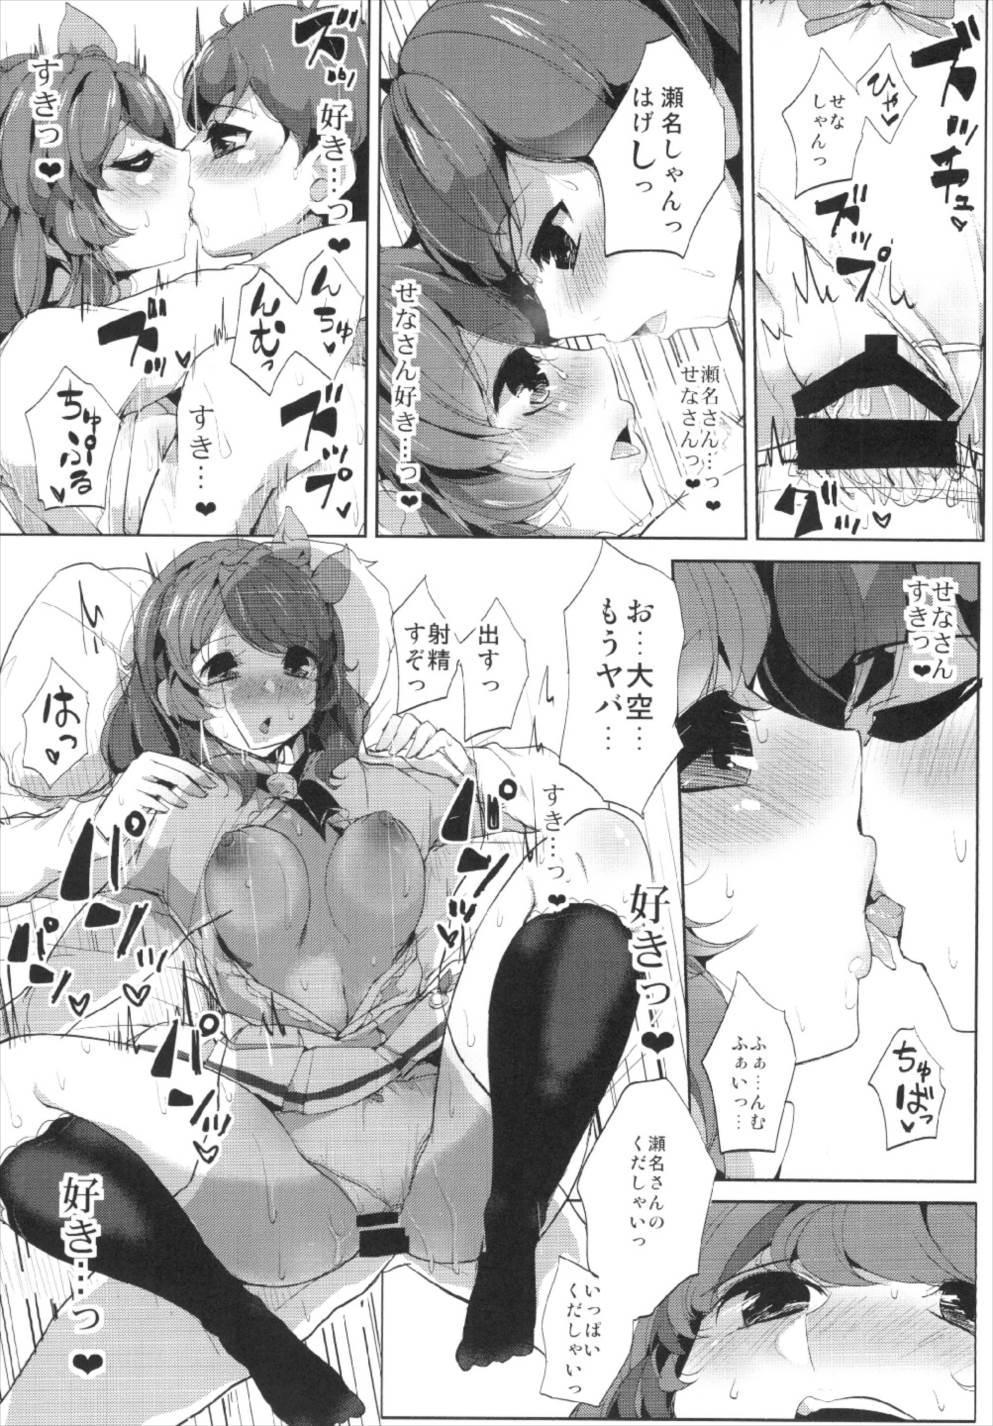 Sena-san Saitte Desu♥ 17